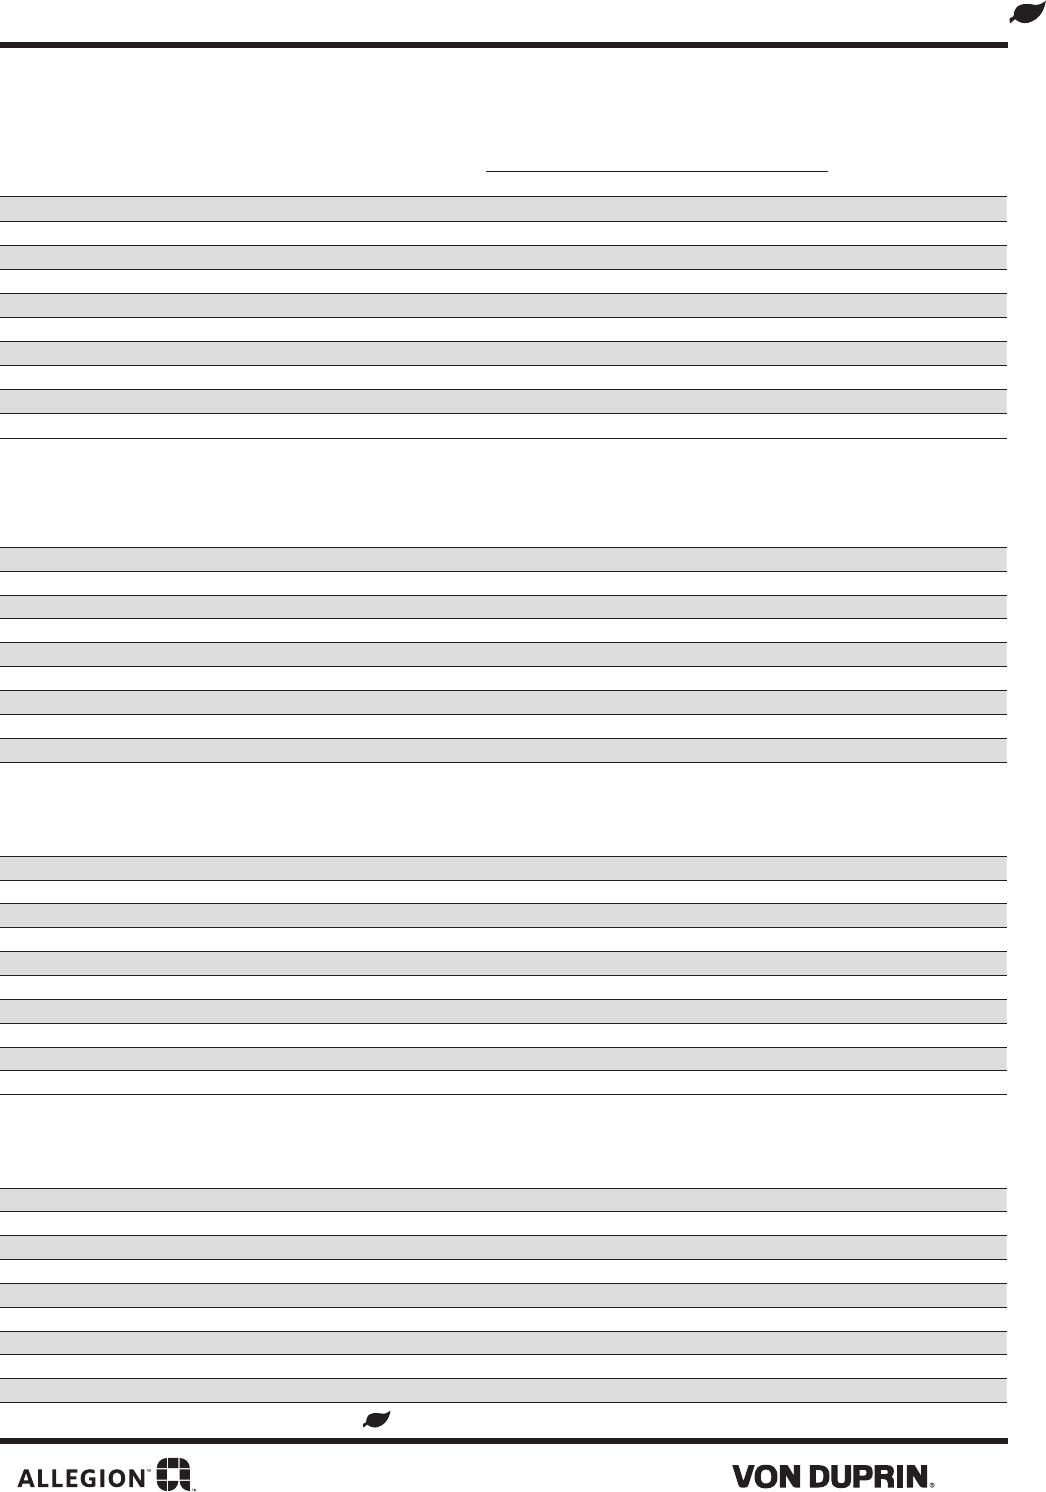 Von Duprin Chexit Wiring Diagram Free Download Ps873 Price Book 2017 Remote At